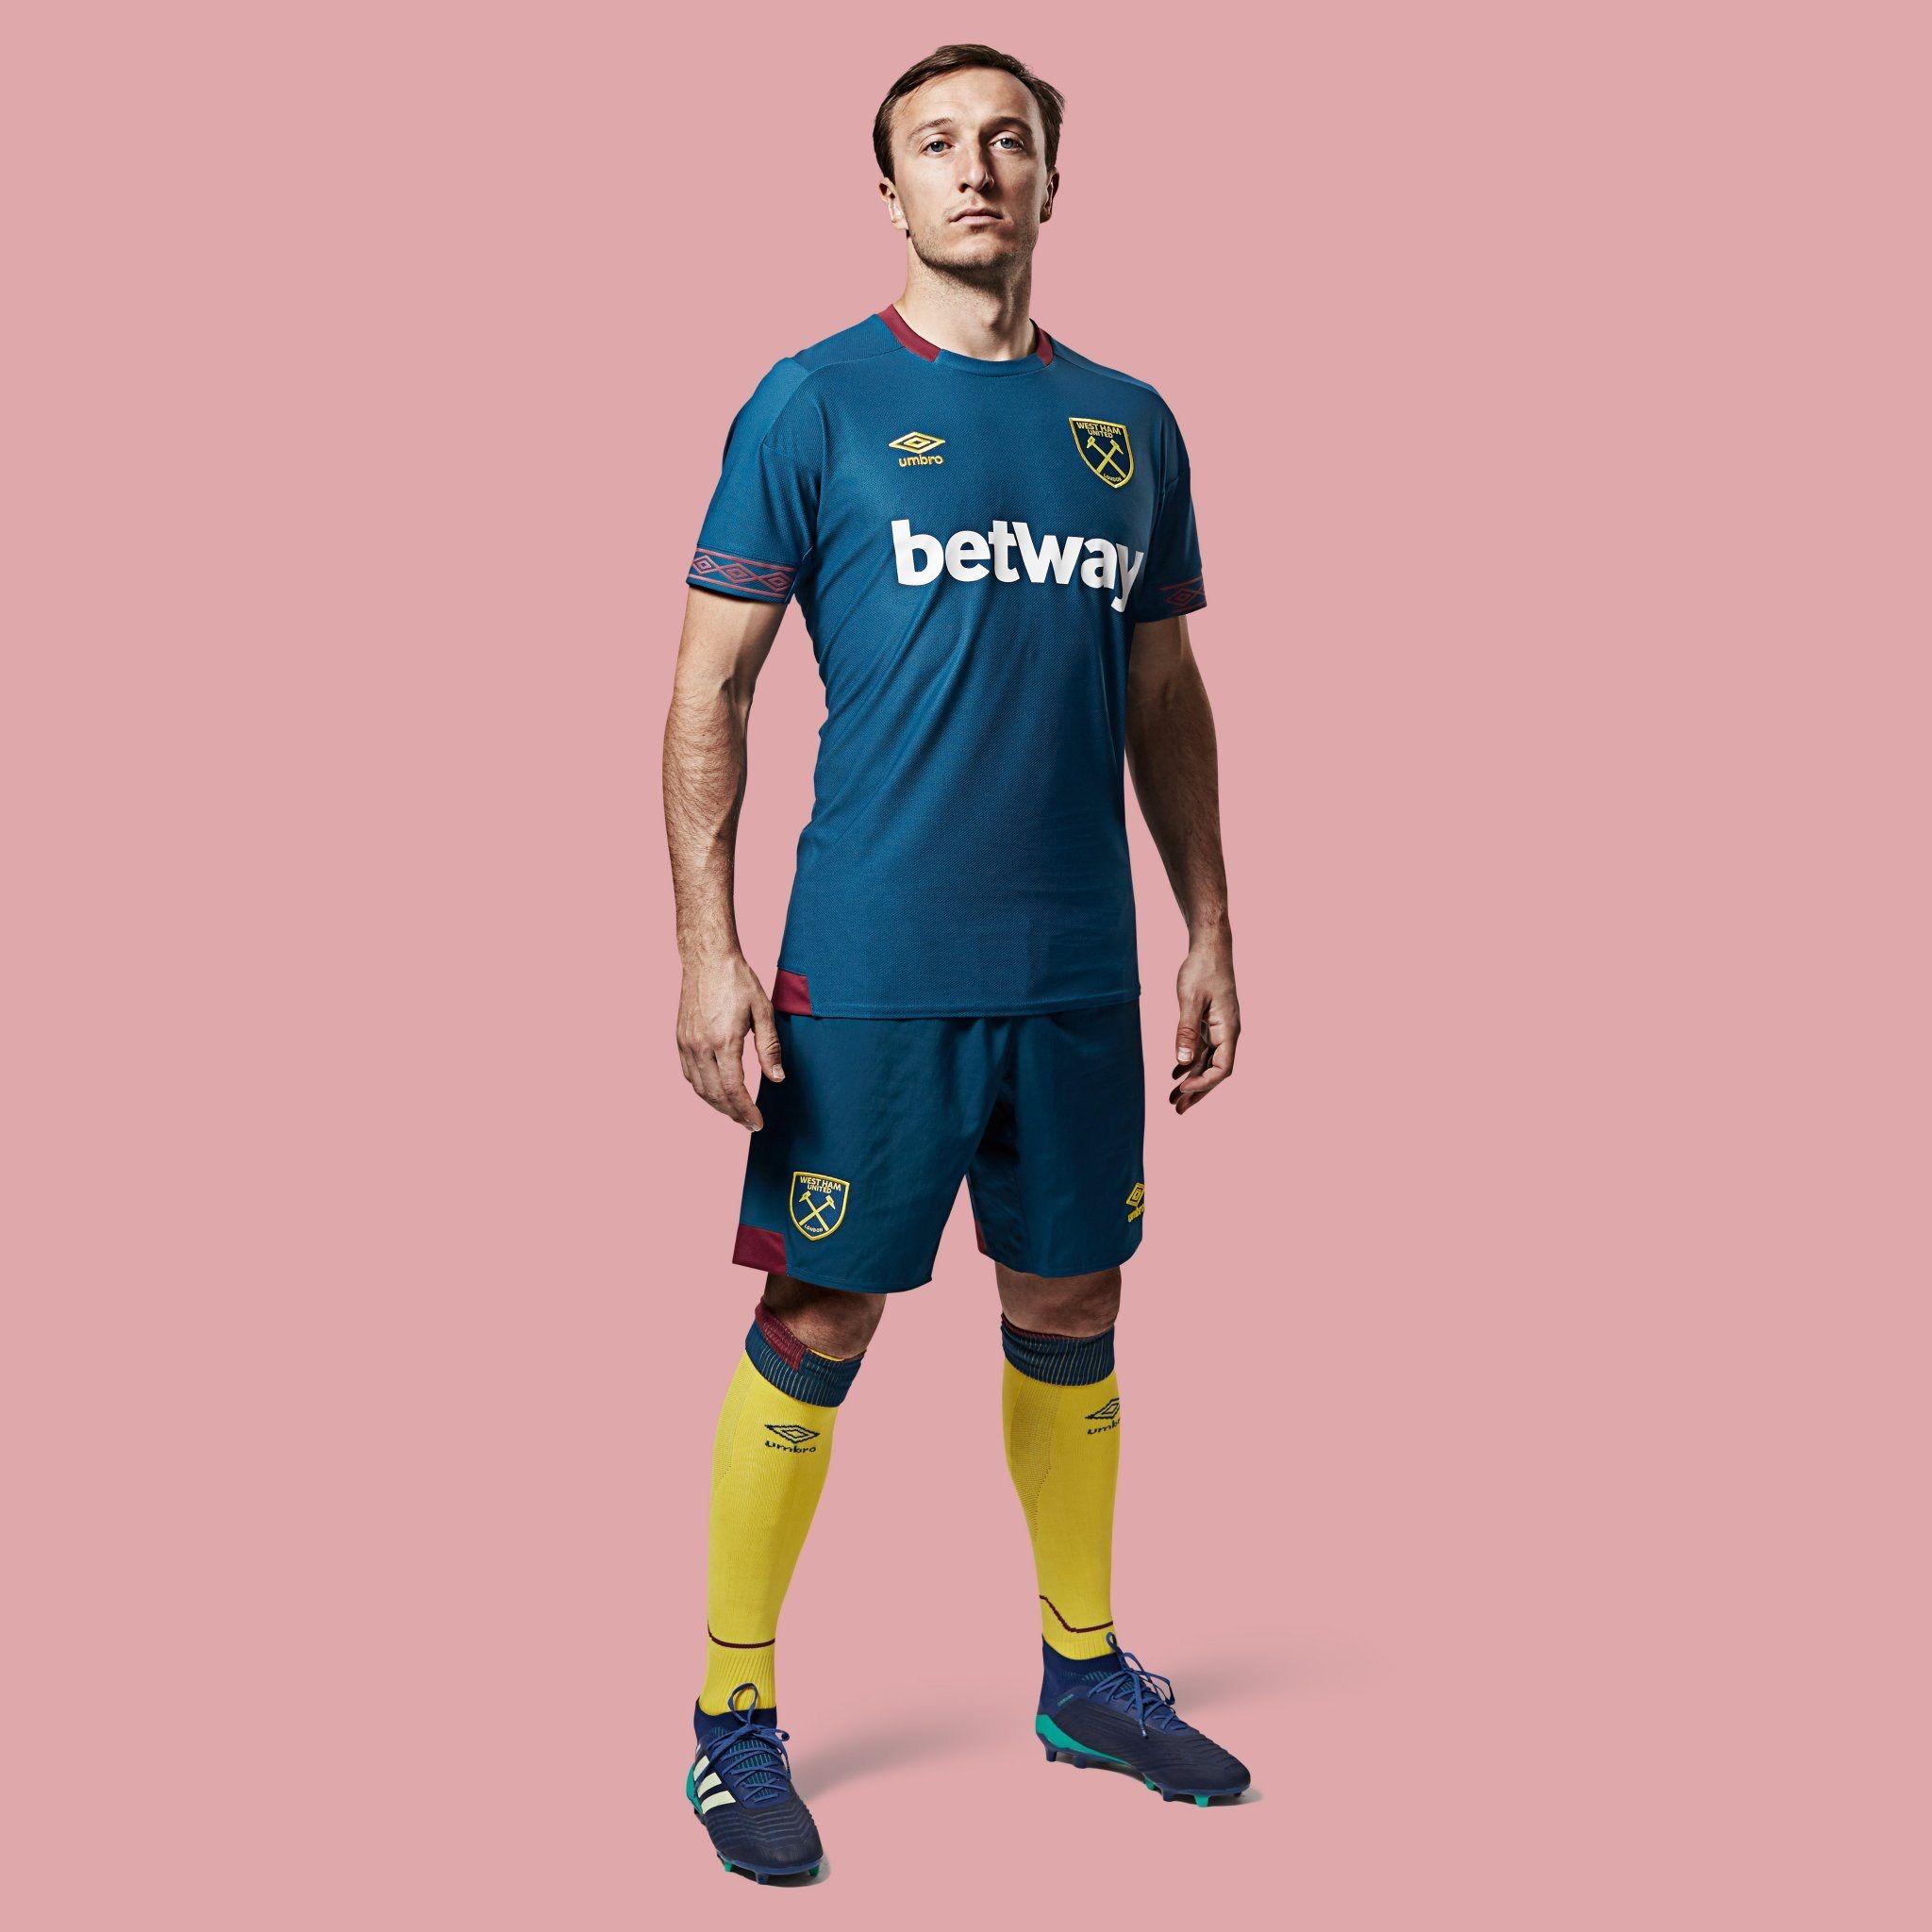 official photos c6775 ac577 West Ham United 2018/2019 Away Kit. | Latest Football Kits ...